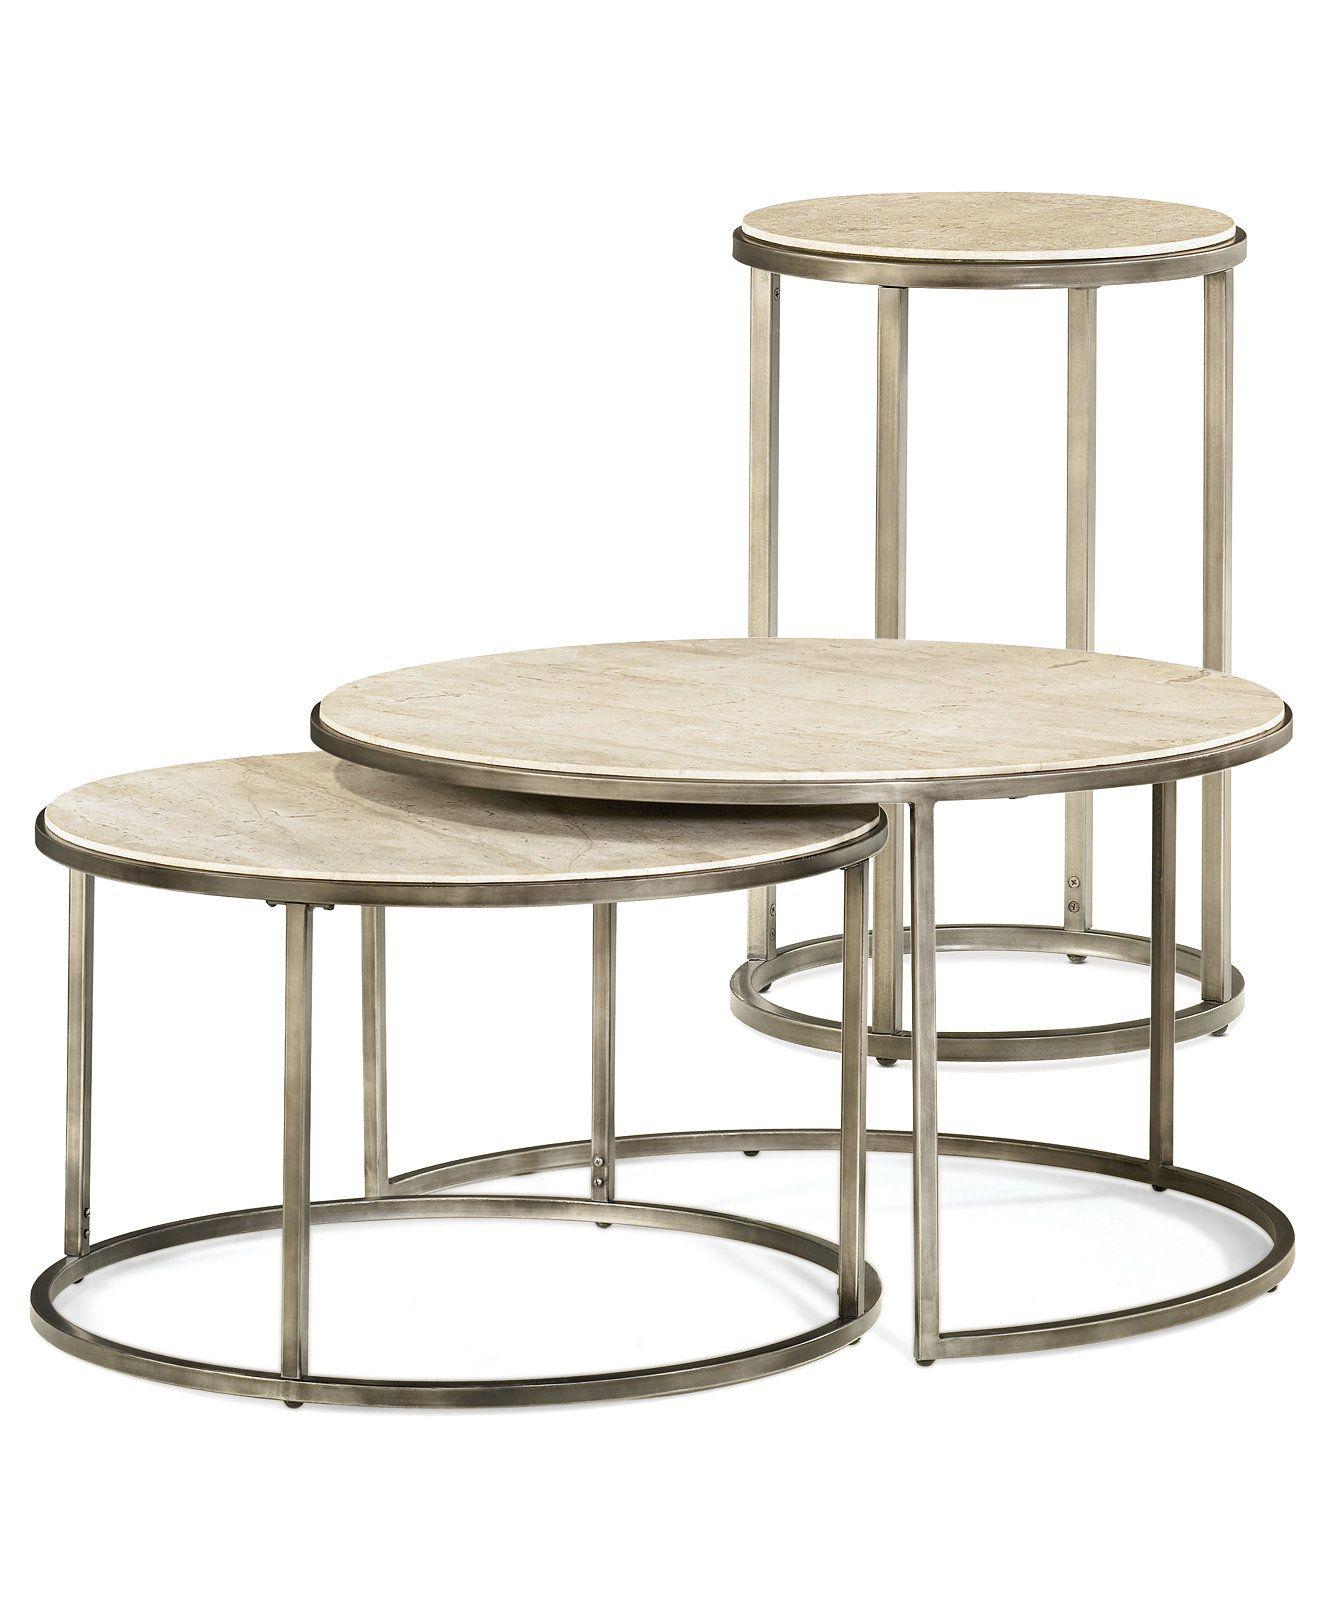 Best Monterey Round Tables 2 Piece Set Nesting Coffee Table 400 x 300